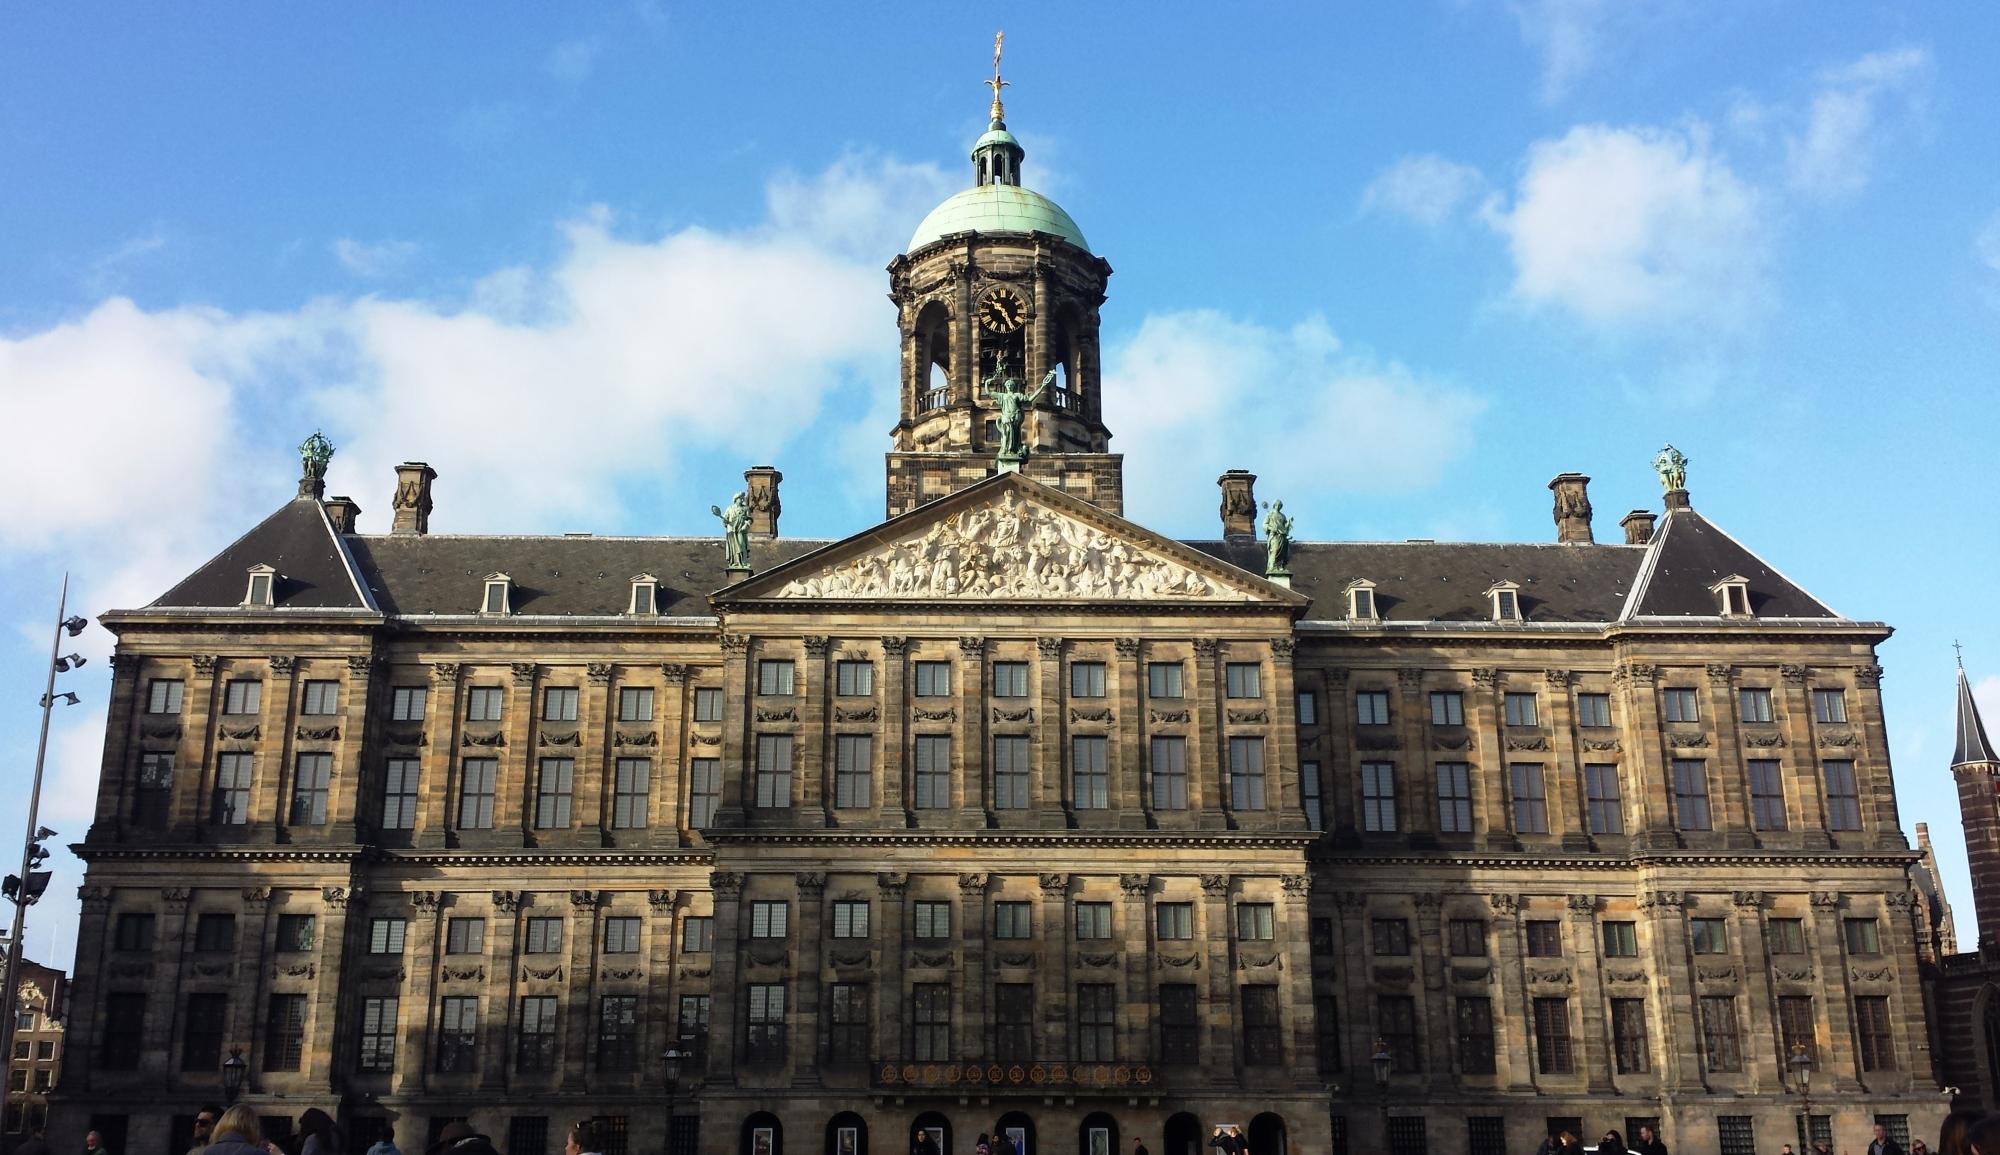 Amsterdam Palace on the Dam